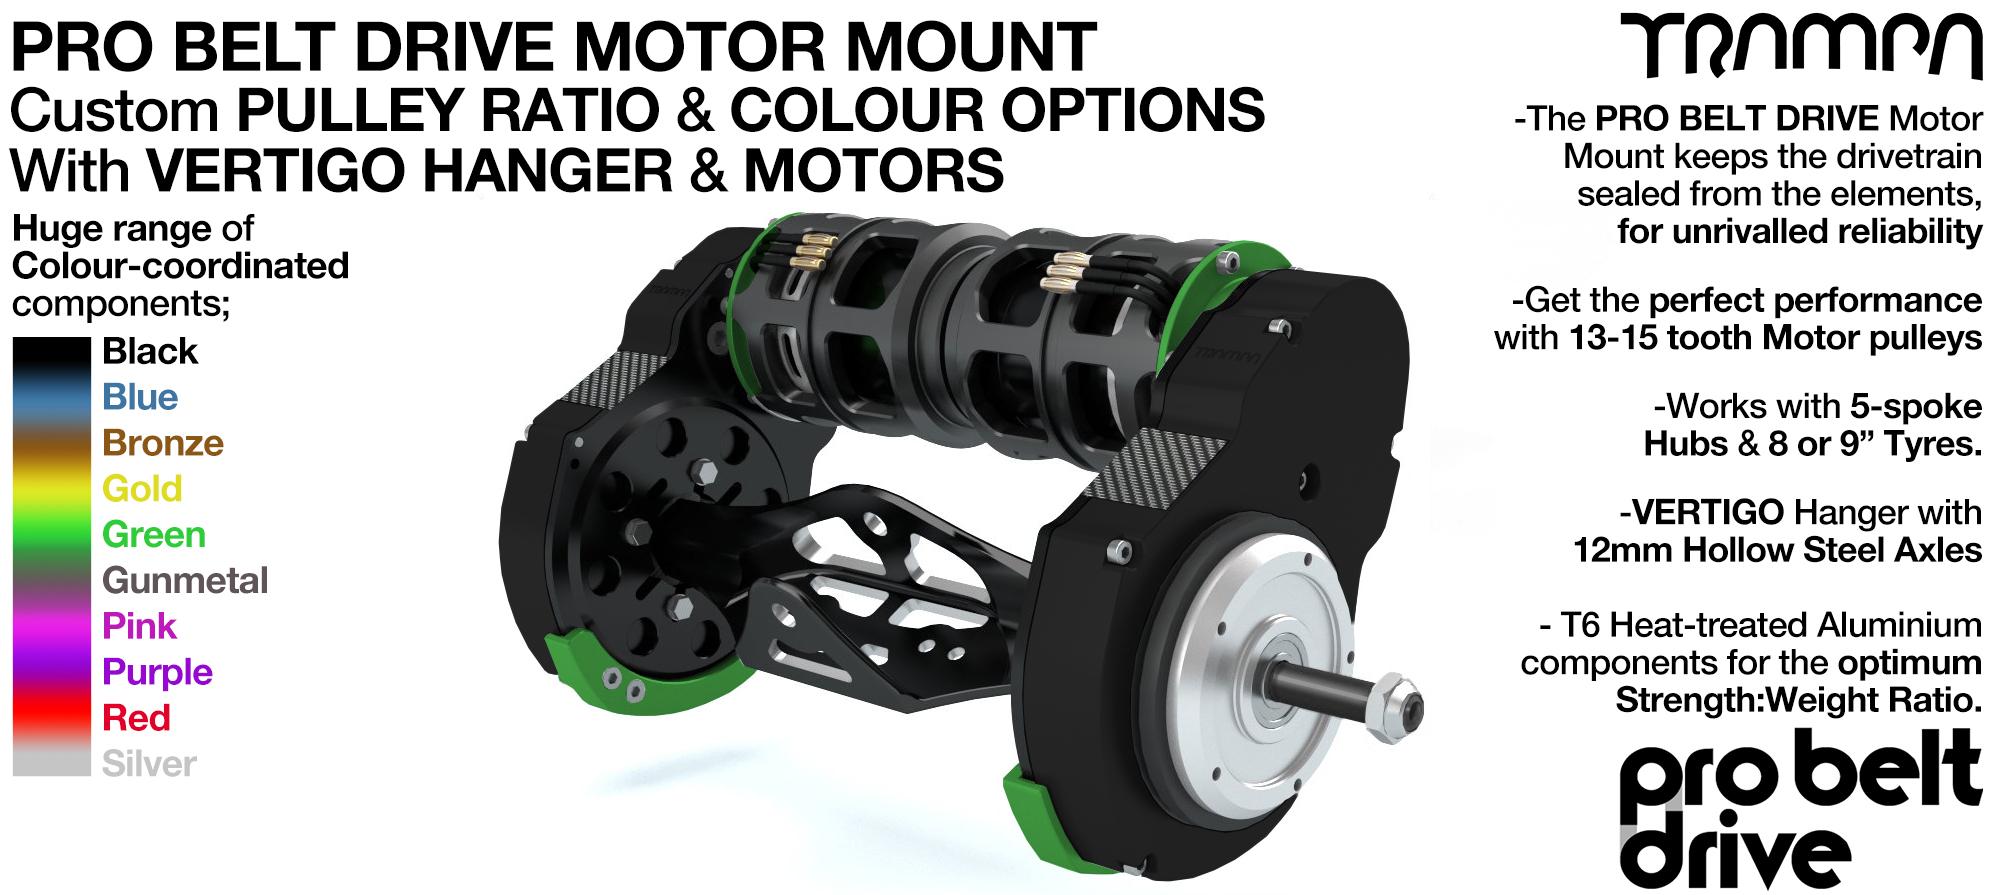 Mountainboard PRO Belt Drive TWIN Motor Mounts WITH Motors & Precision VERTIGO Hanger